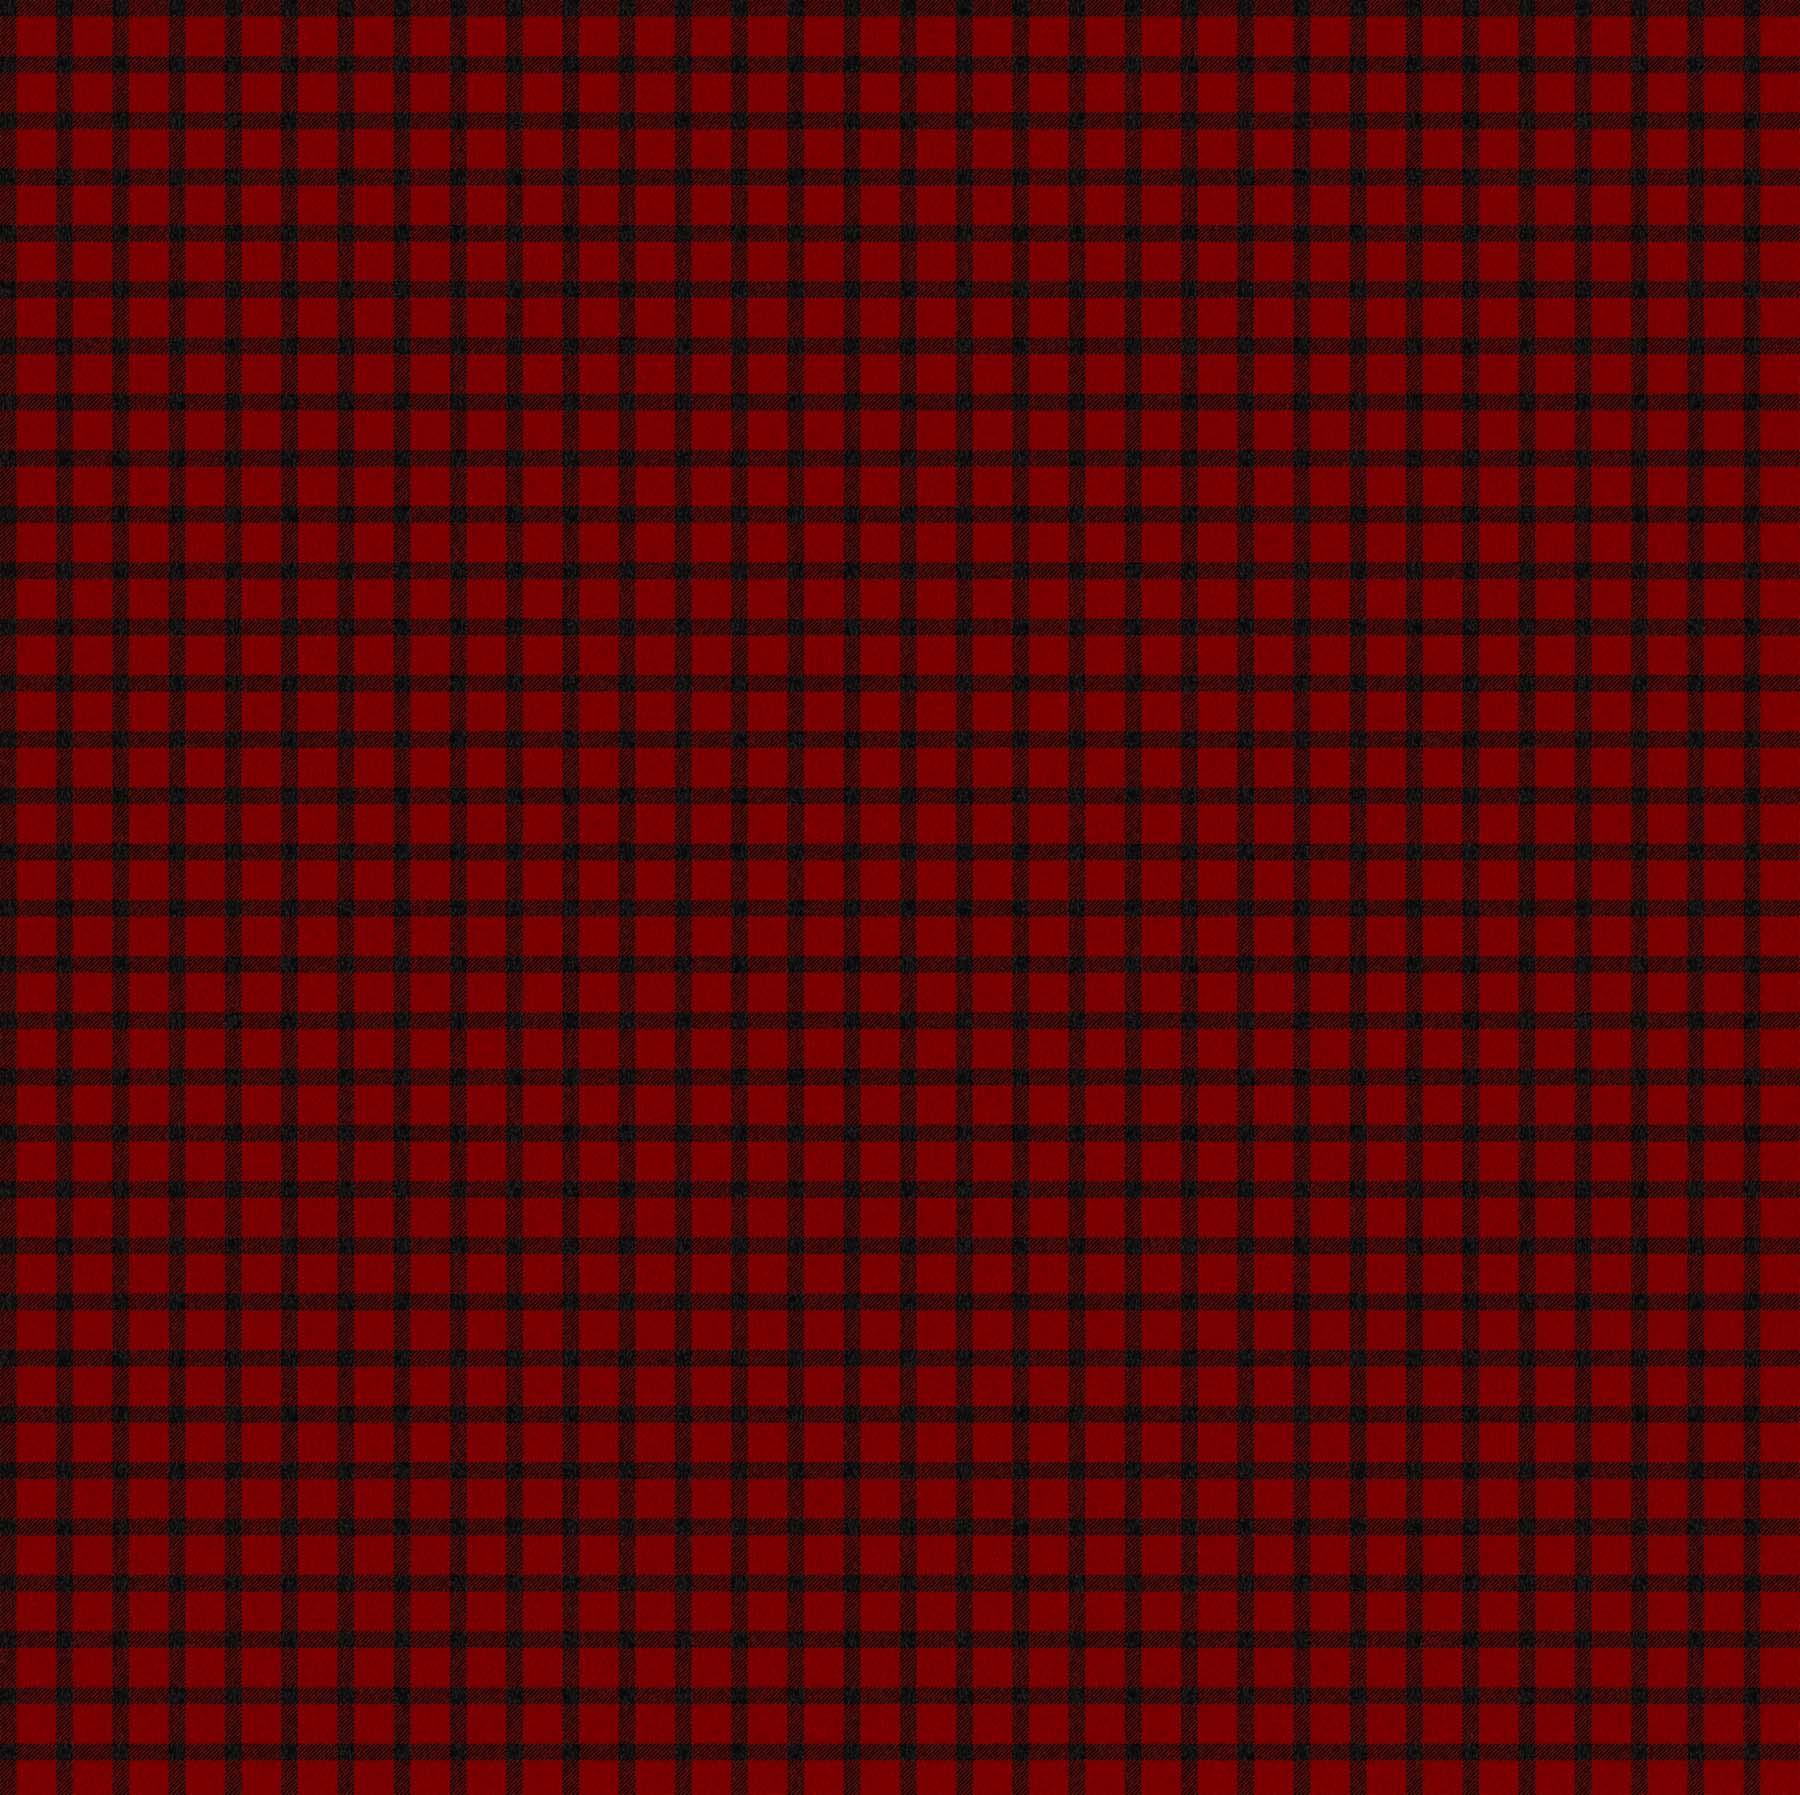 WEST CREEK RED BLACK Elmgrove W23908-24